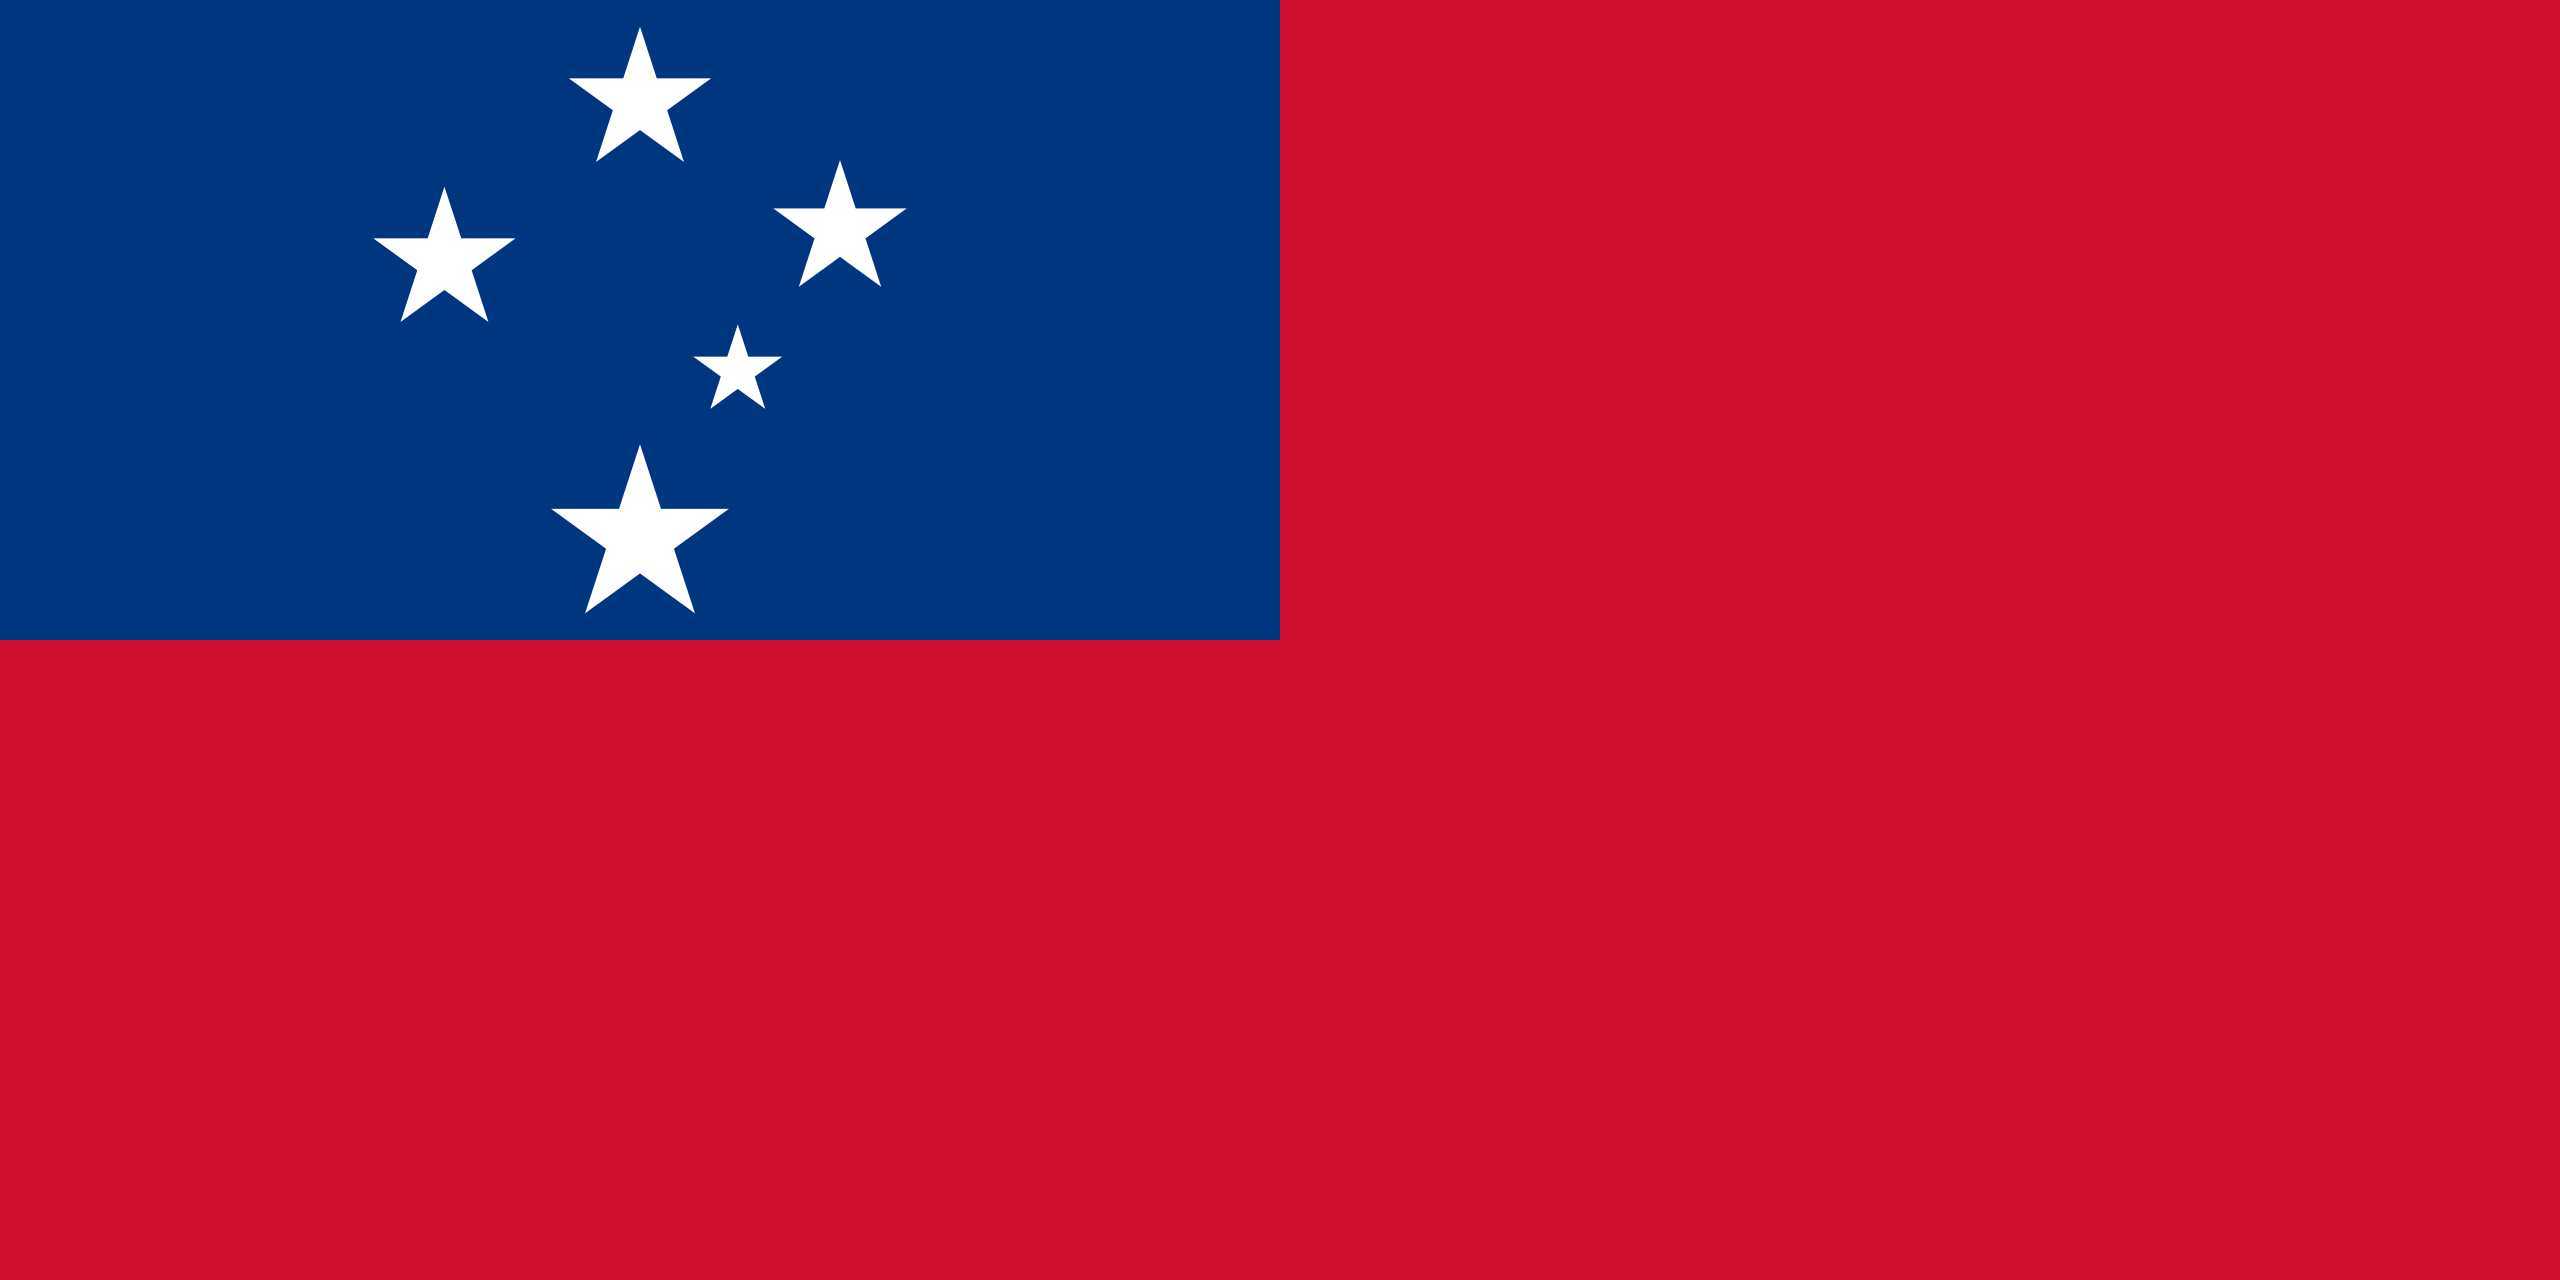 Самоа, страна, Эмблема, логотип, символ - Обои HD - Профессор falken.com